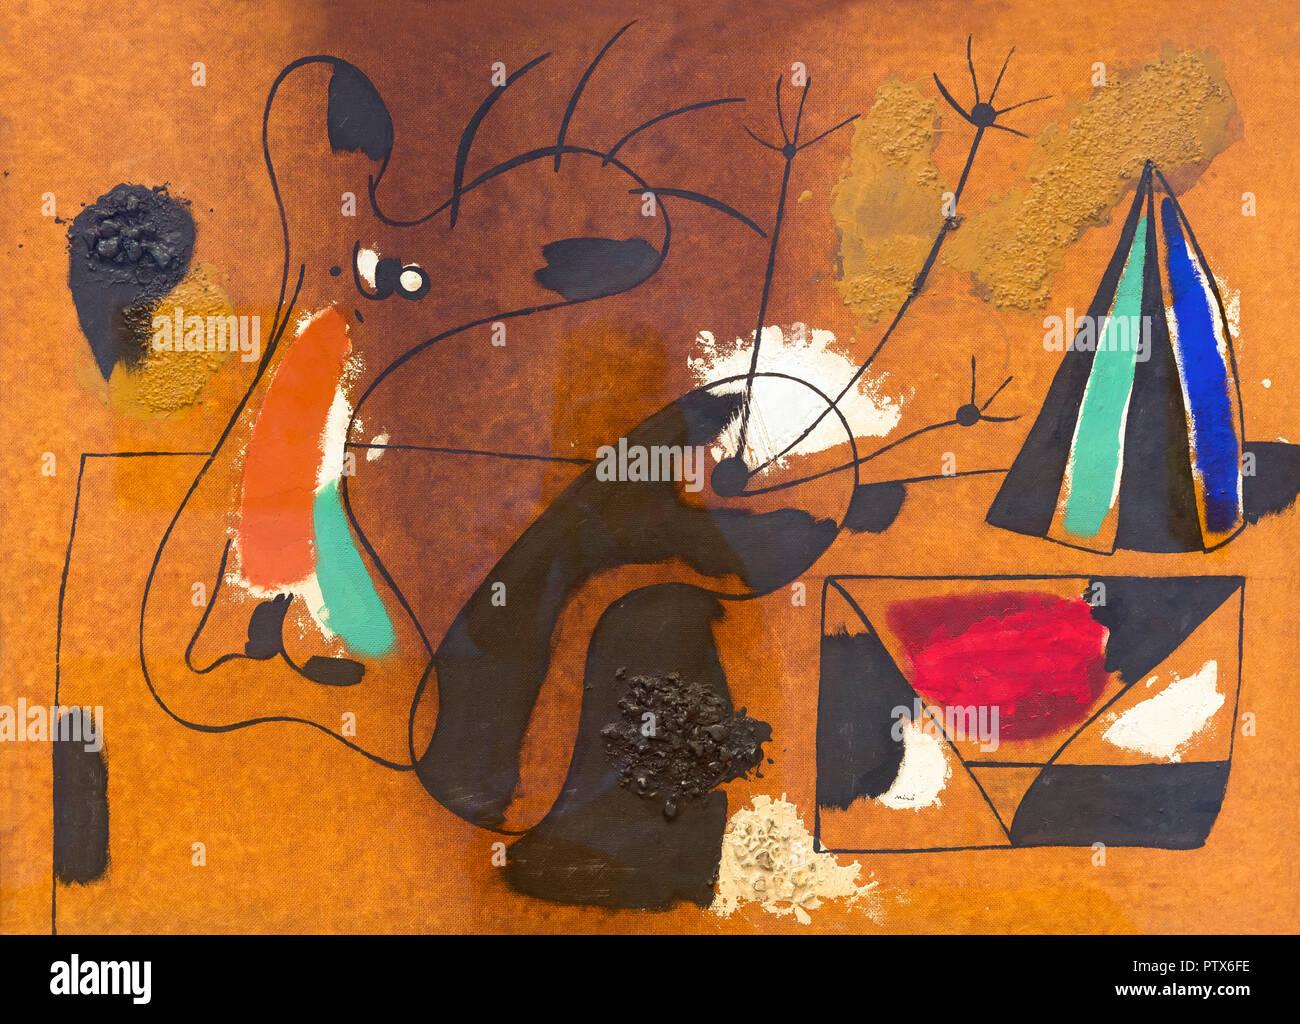 Painting, Joan Miro, 1936,Art Institute of Chicago, Chicago, Illinois, USA, North America - Stock Image